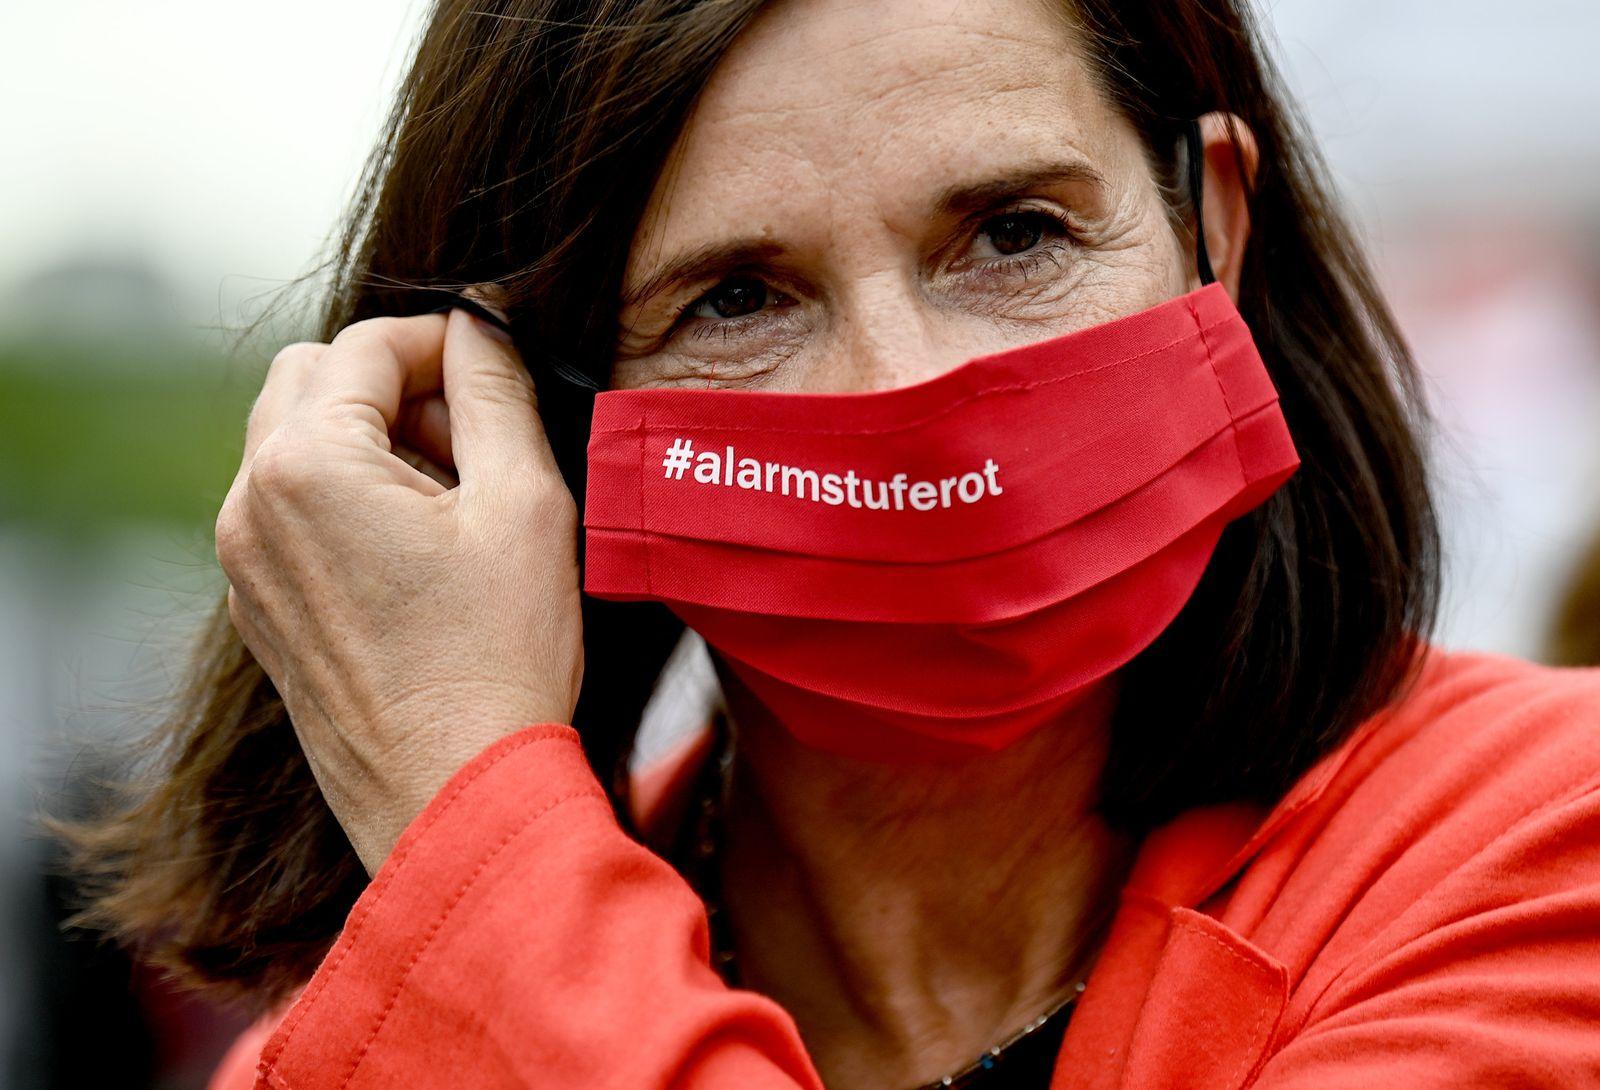 Demonstration #AlarmstufeRot